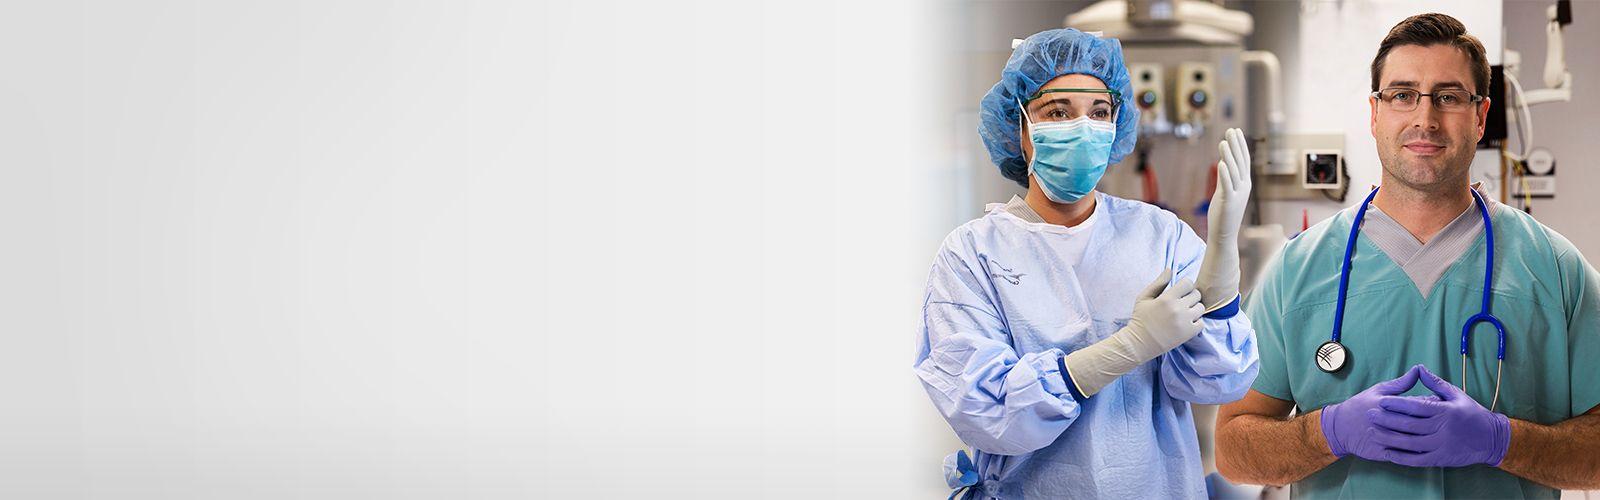 Surgeon and nurse wearing gloves.